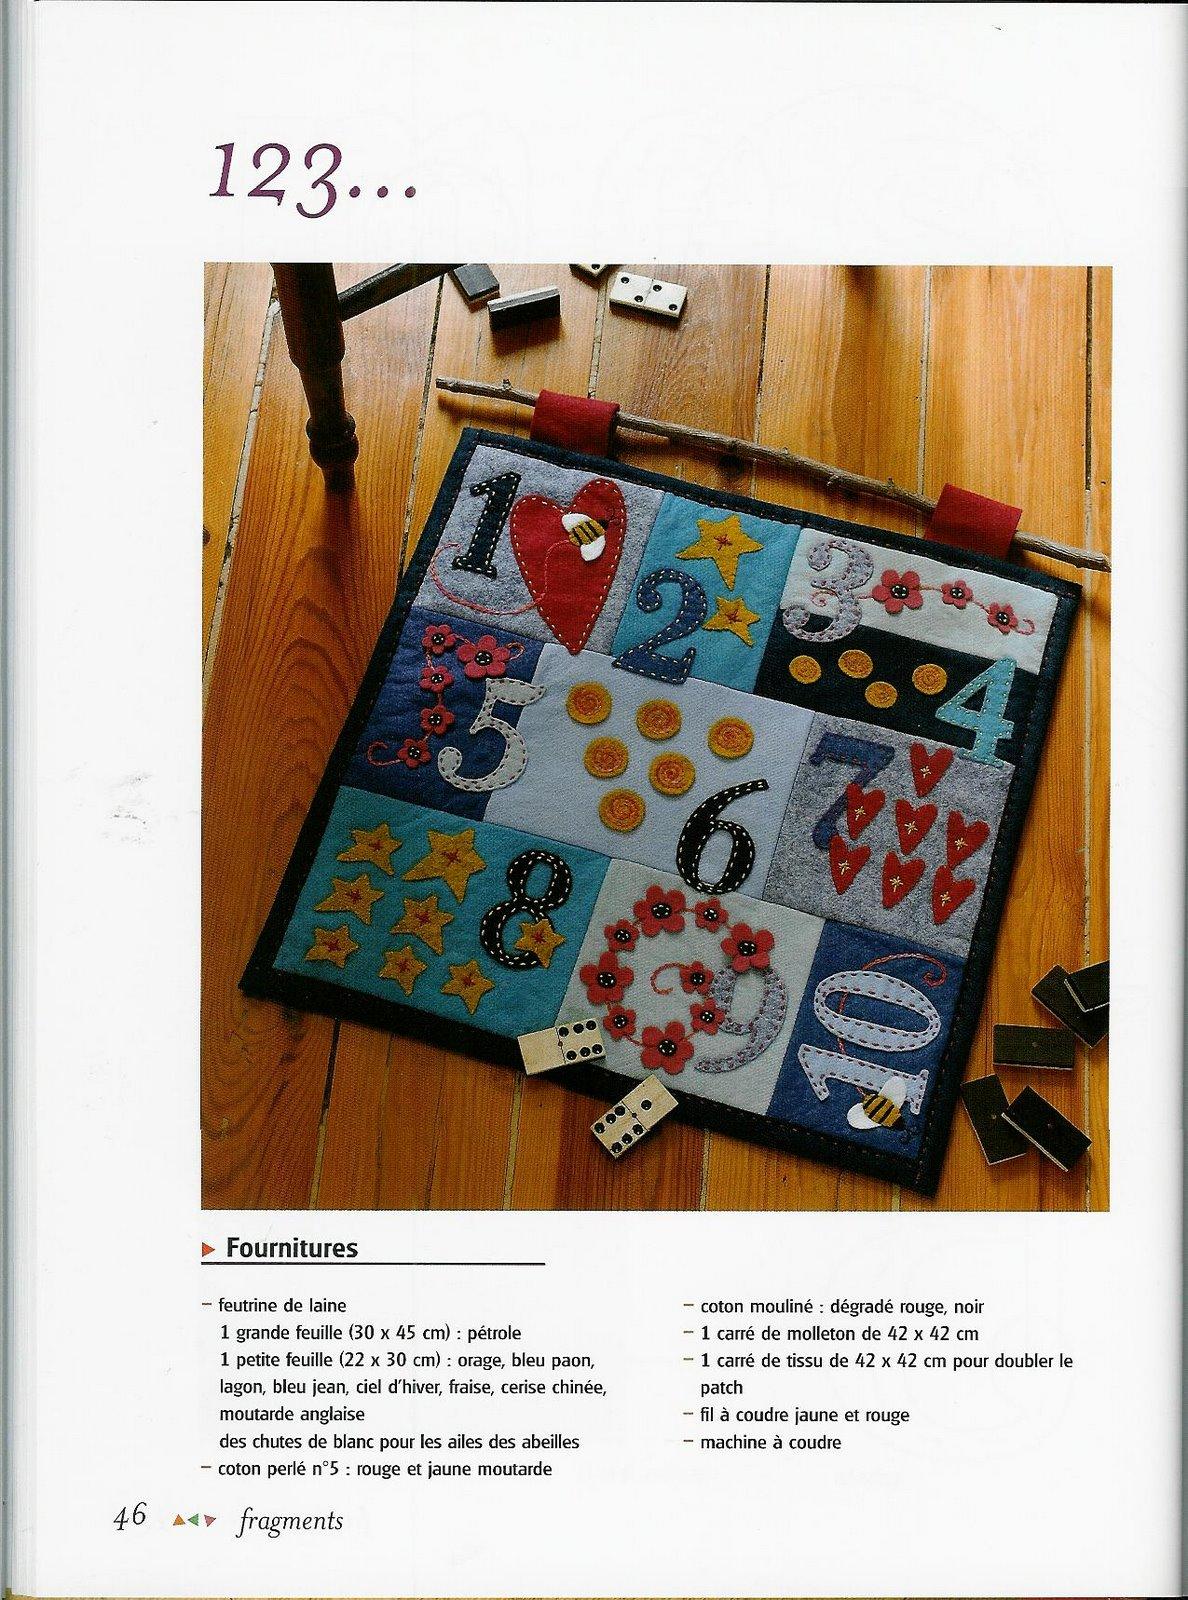 Fieltro abecedar o cojines para los mas peque os bolsos tapices alfileteros - Cojines pequenos ...